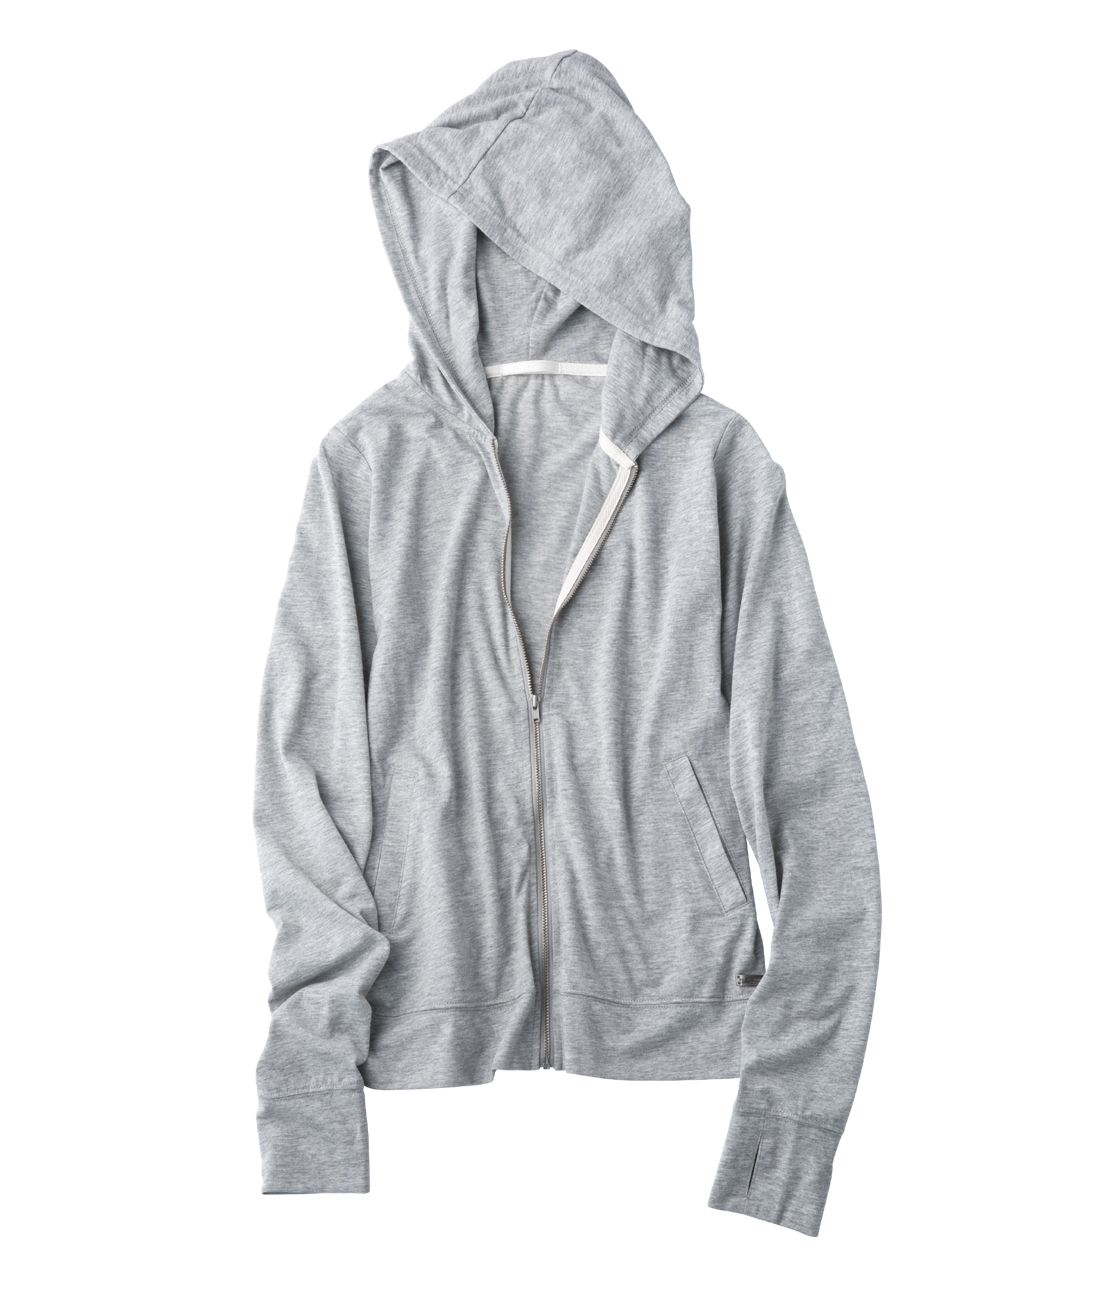 UV cut quick drying sweat hoody